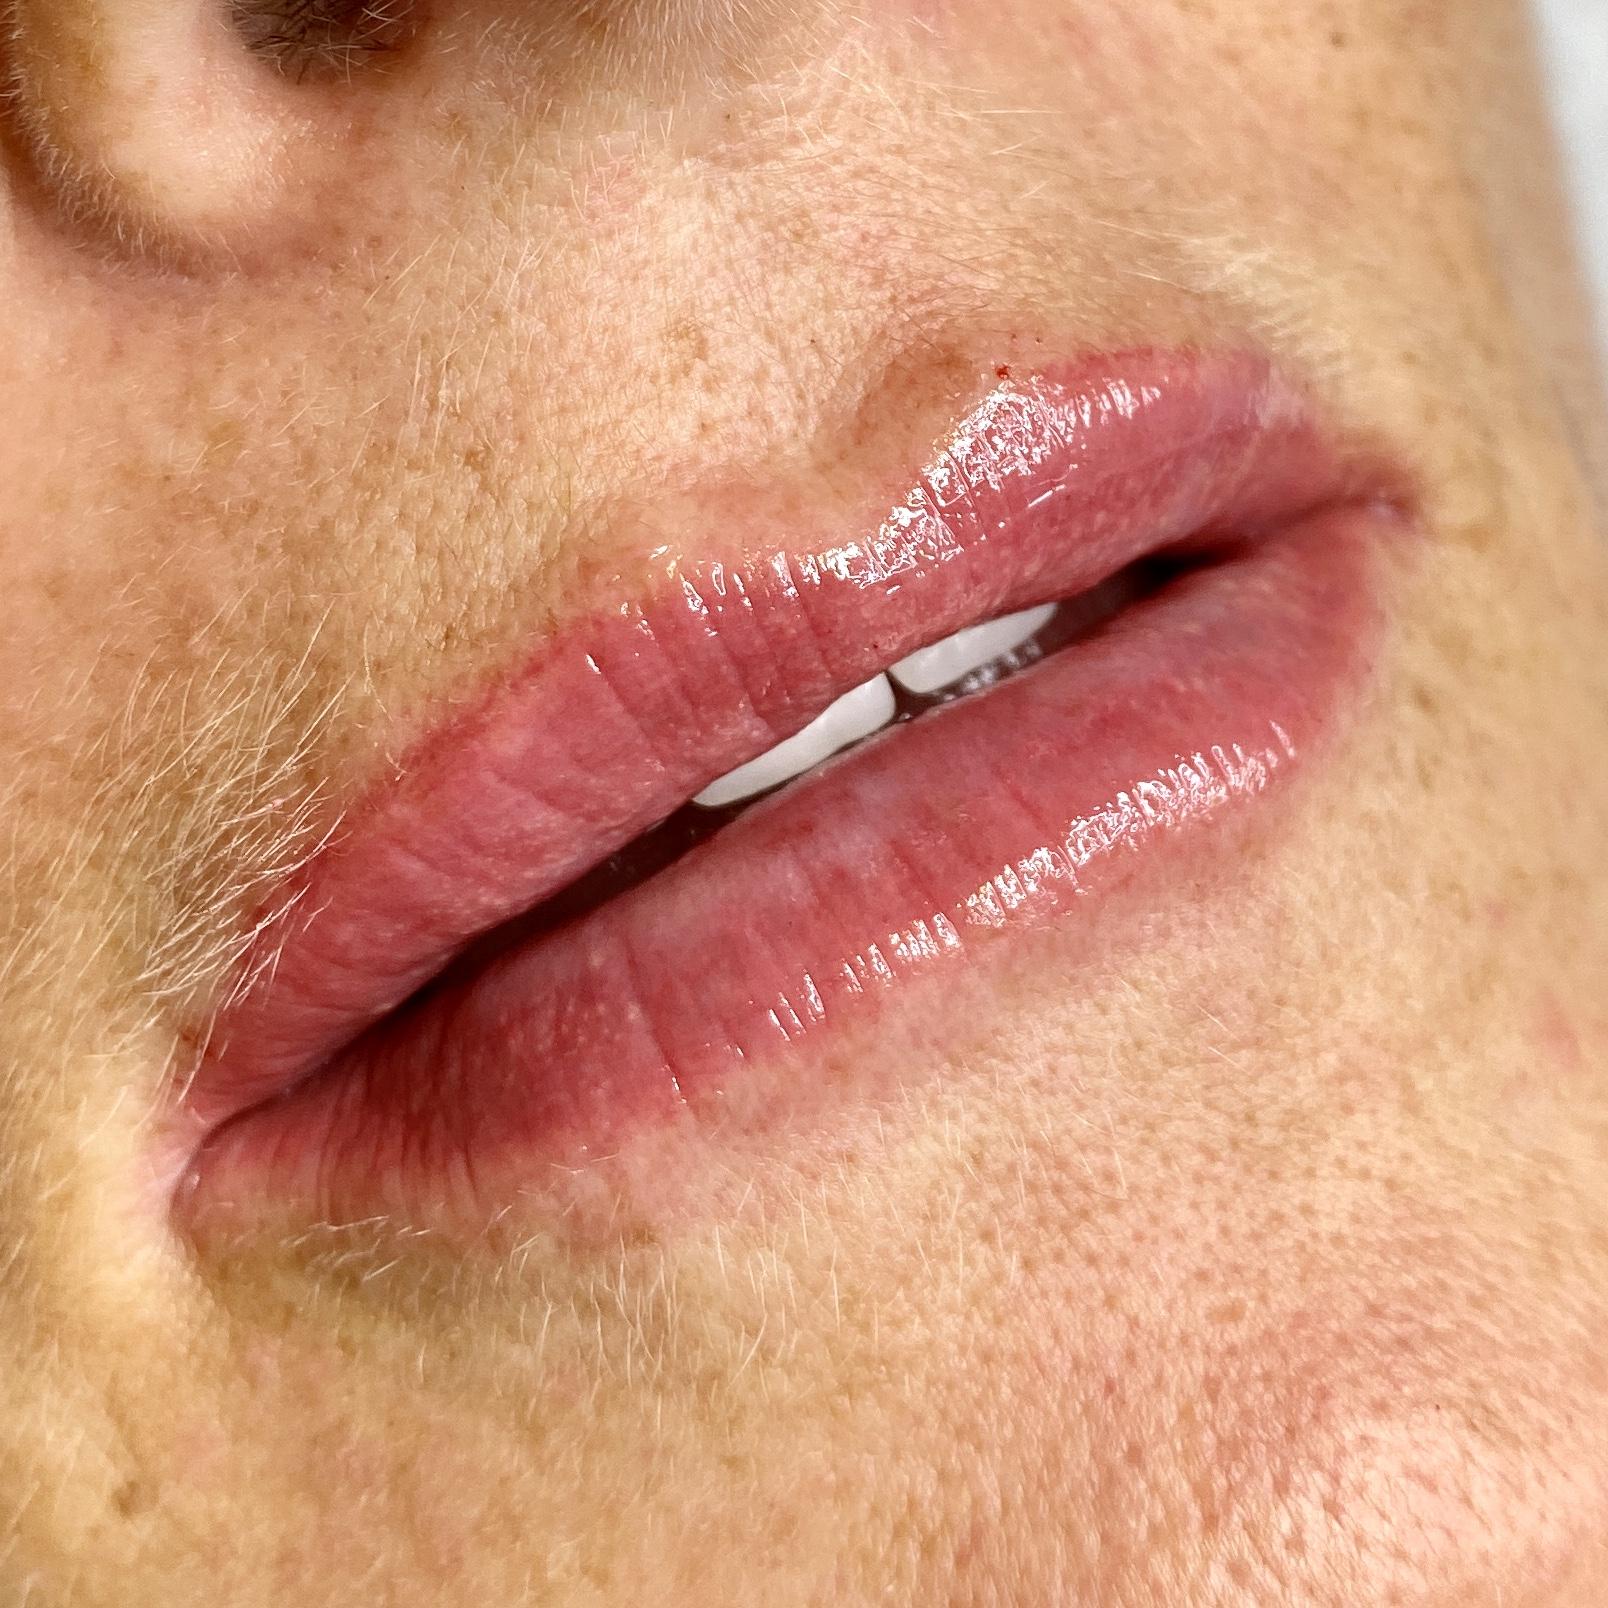 0.8ml Lip Augmentation